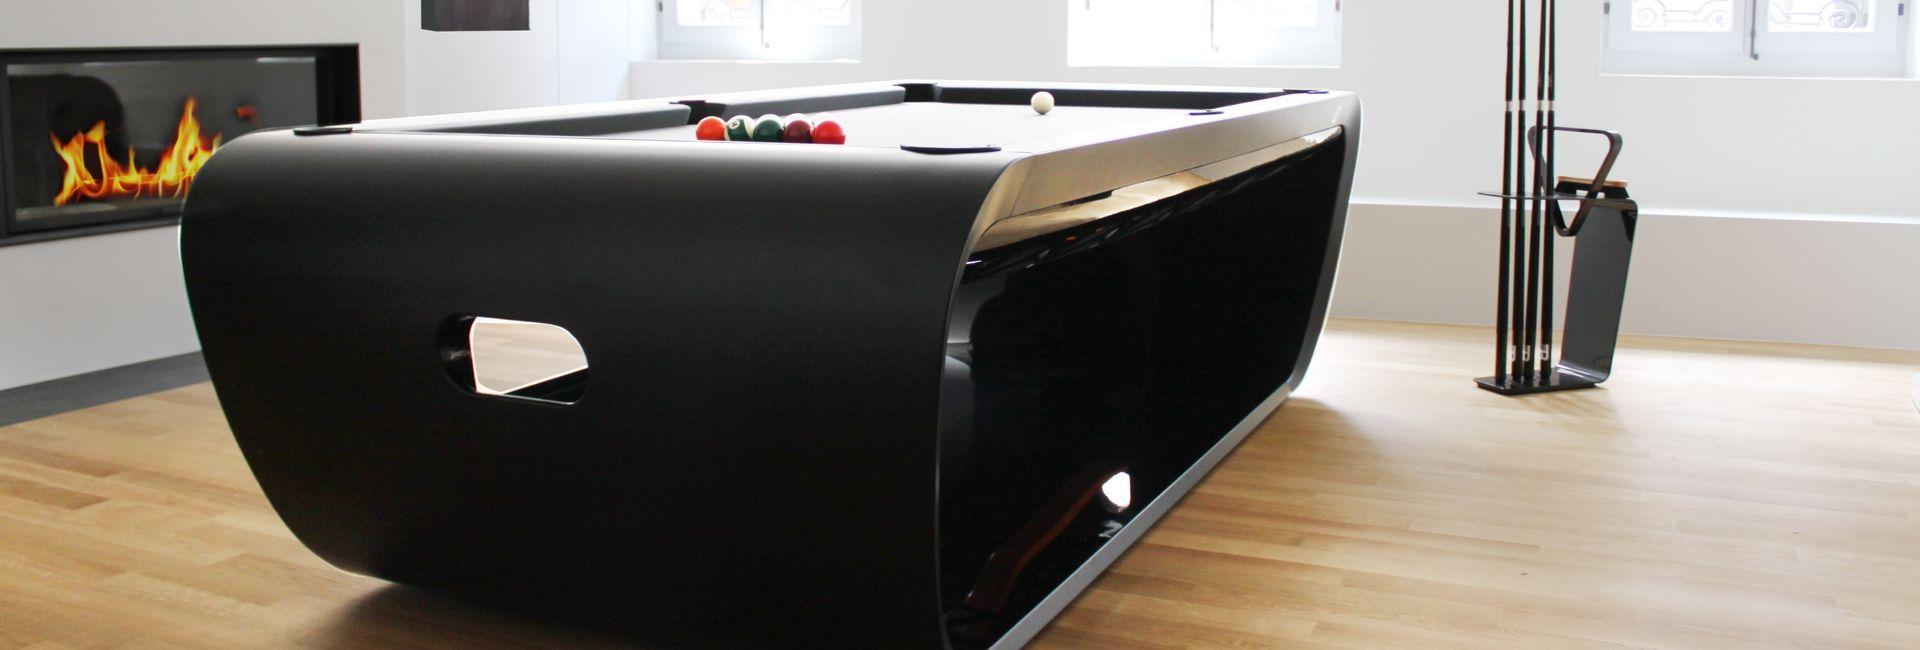 Customizable Luxury Billiards - Design - Billiards Tuulet